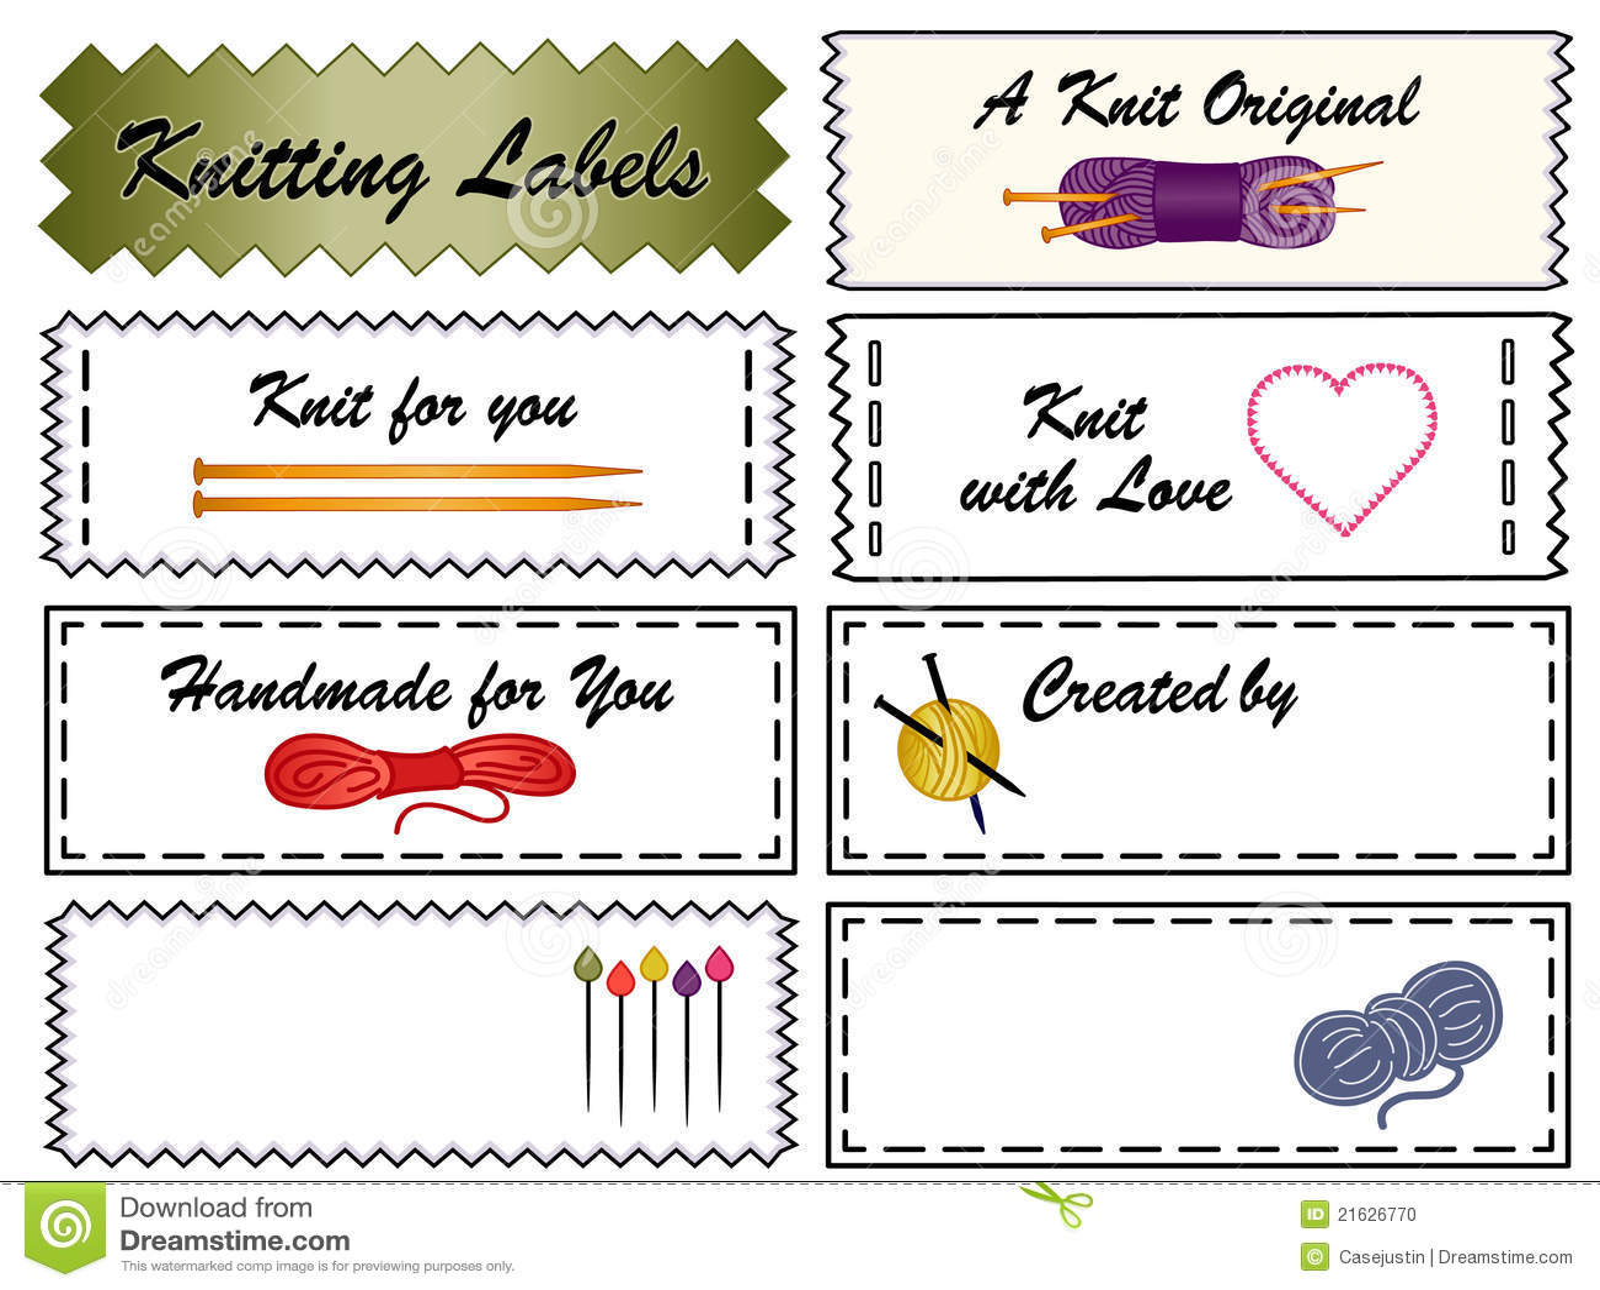 Knitting Labels Free : Knitting labels stock photo image